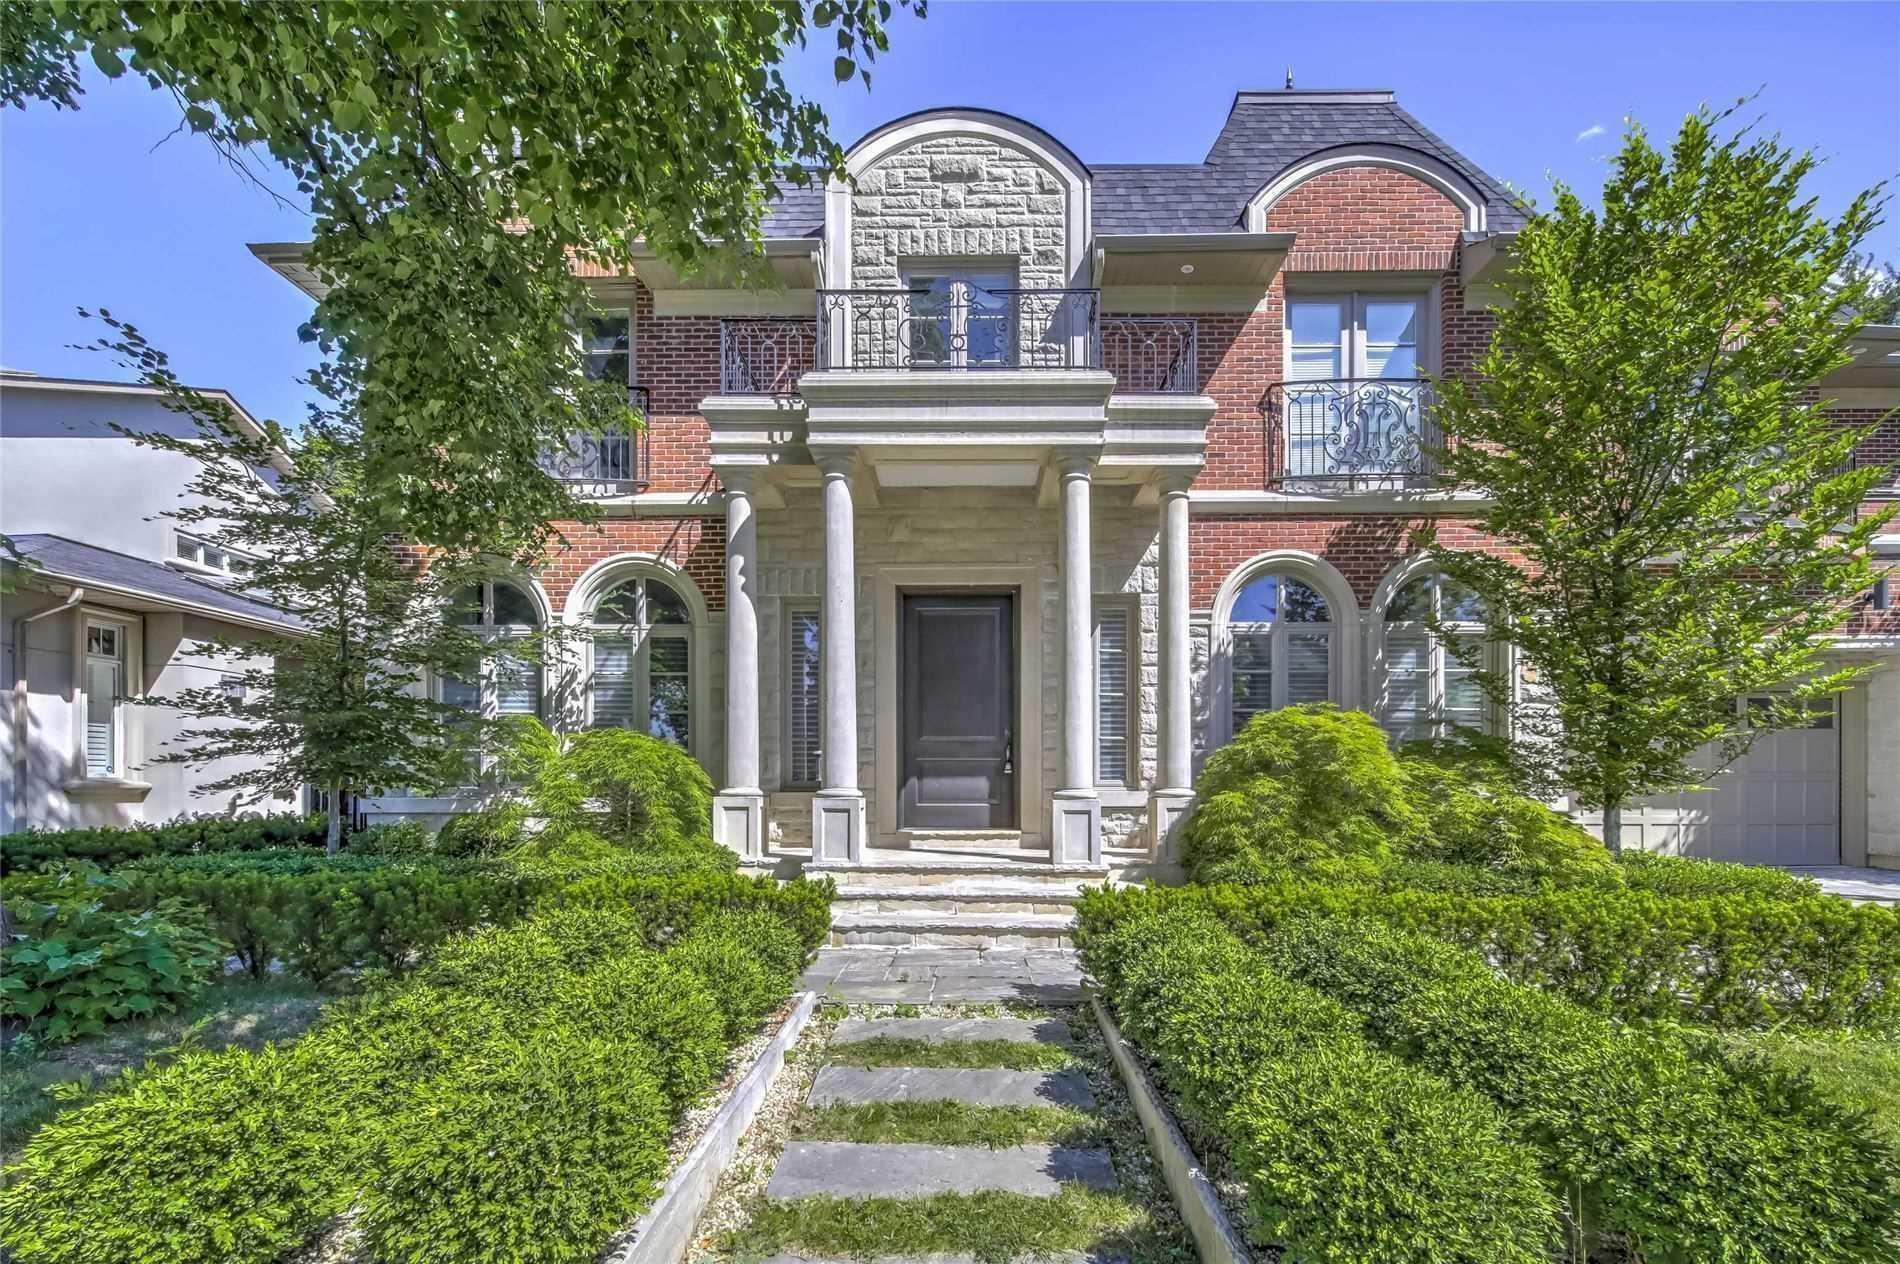 93 Larkfield Dr, Toronto, Ontario M3B2H6, 5 Bedrooms Bedrooms, 11 Rooms Rooms,8 BathroomsBathrooms,Detached,For Sale,Larkfield,C5082110